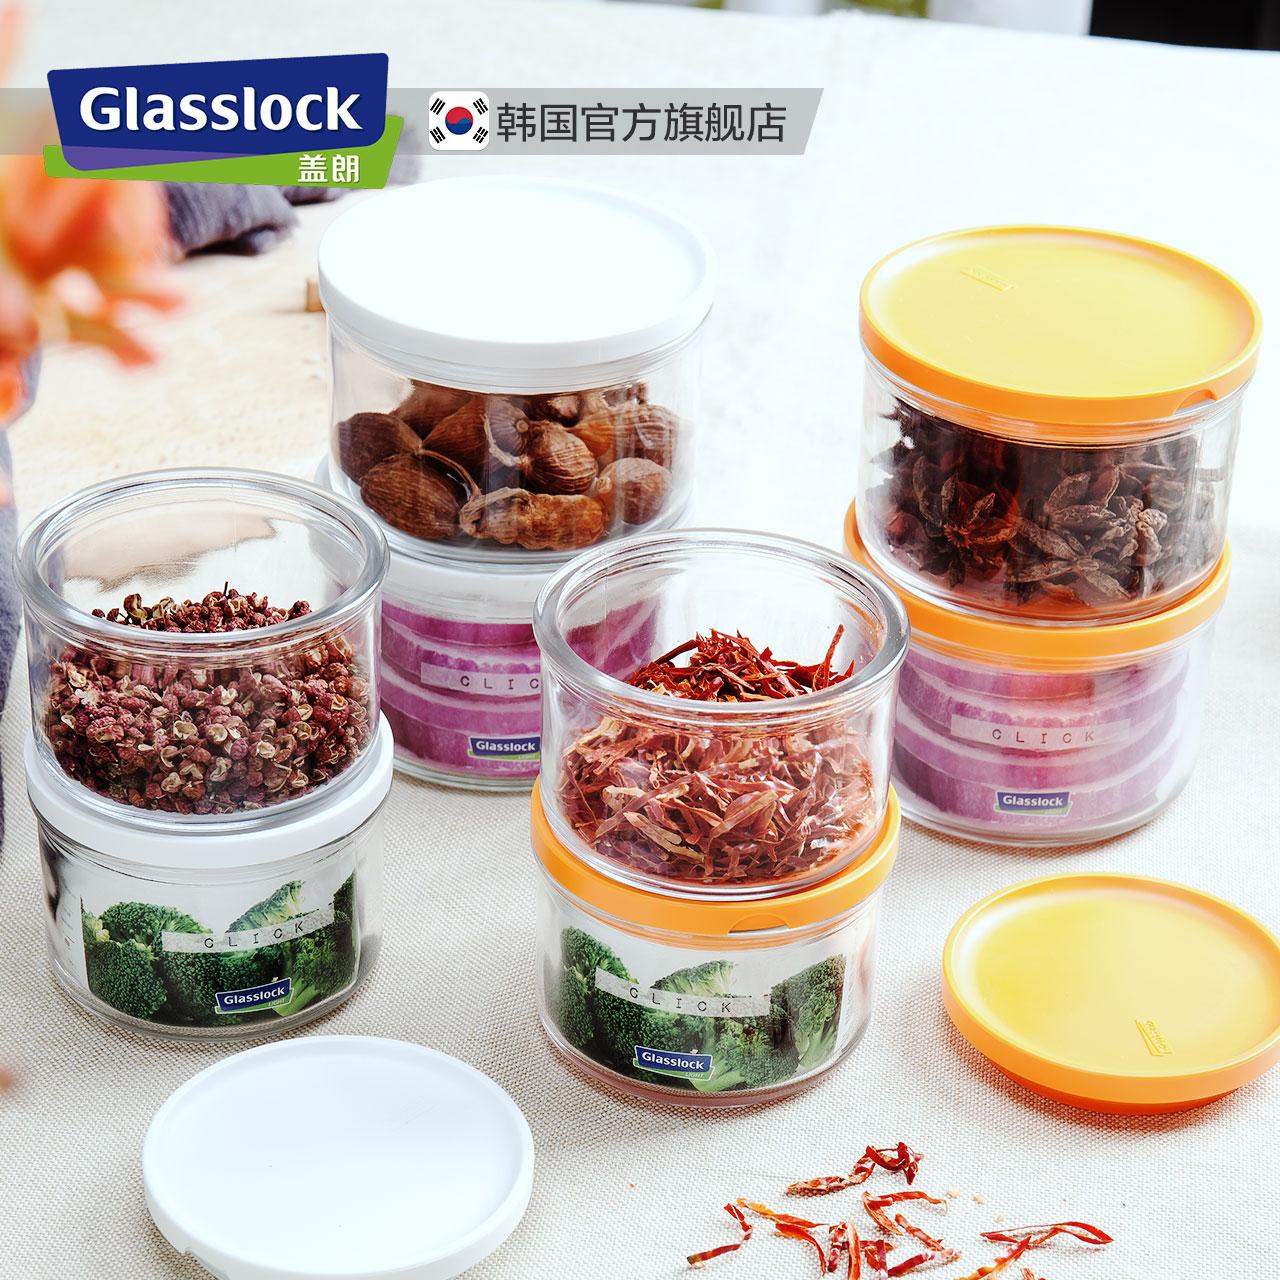 Glasslock韓國玻璃罐透明瓶子食品酵素蜂蜜檸檬百香果帶蓋儲物罐